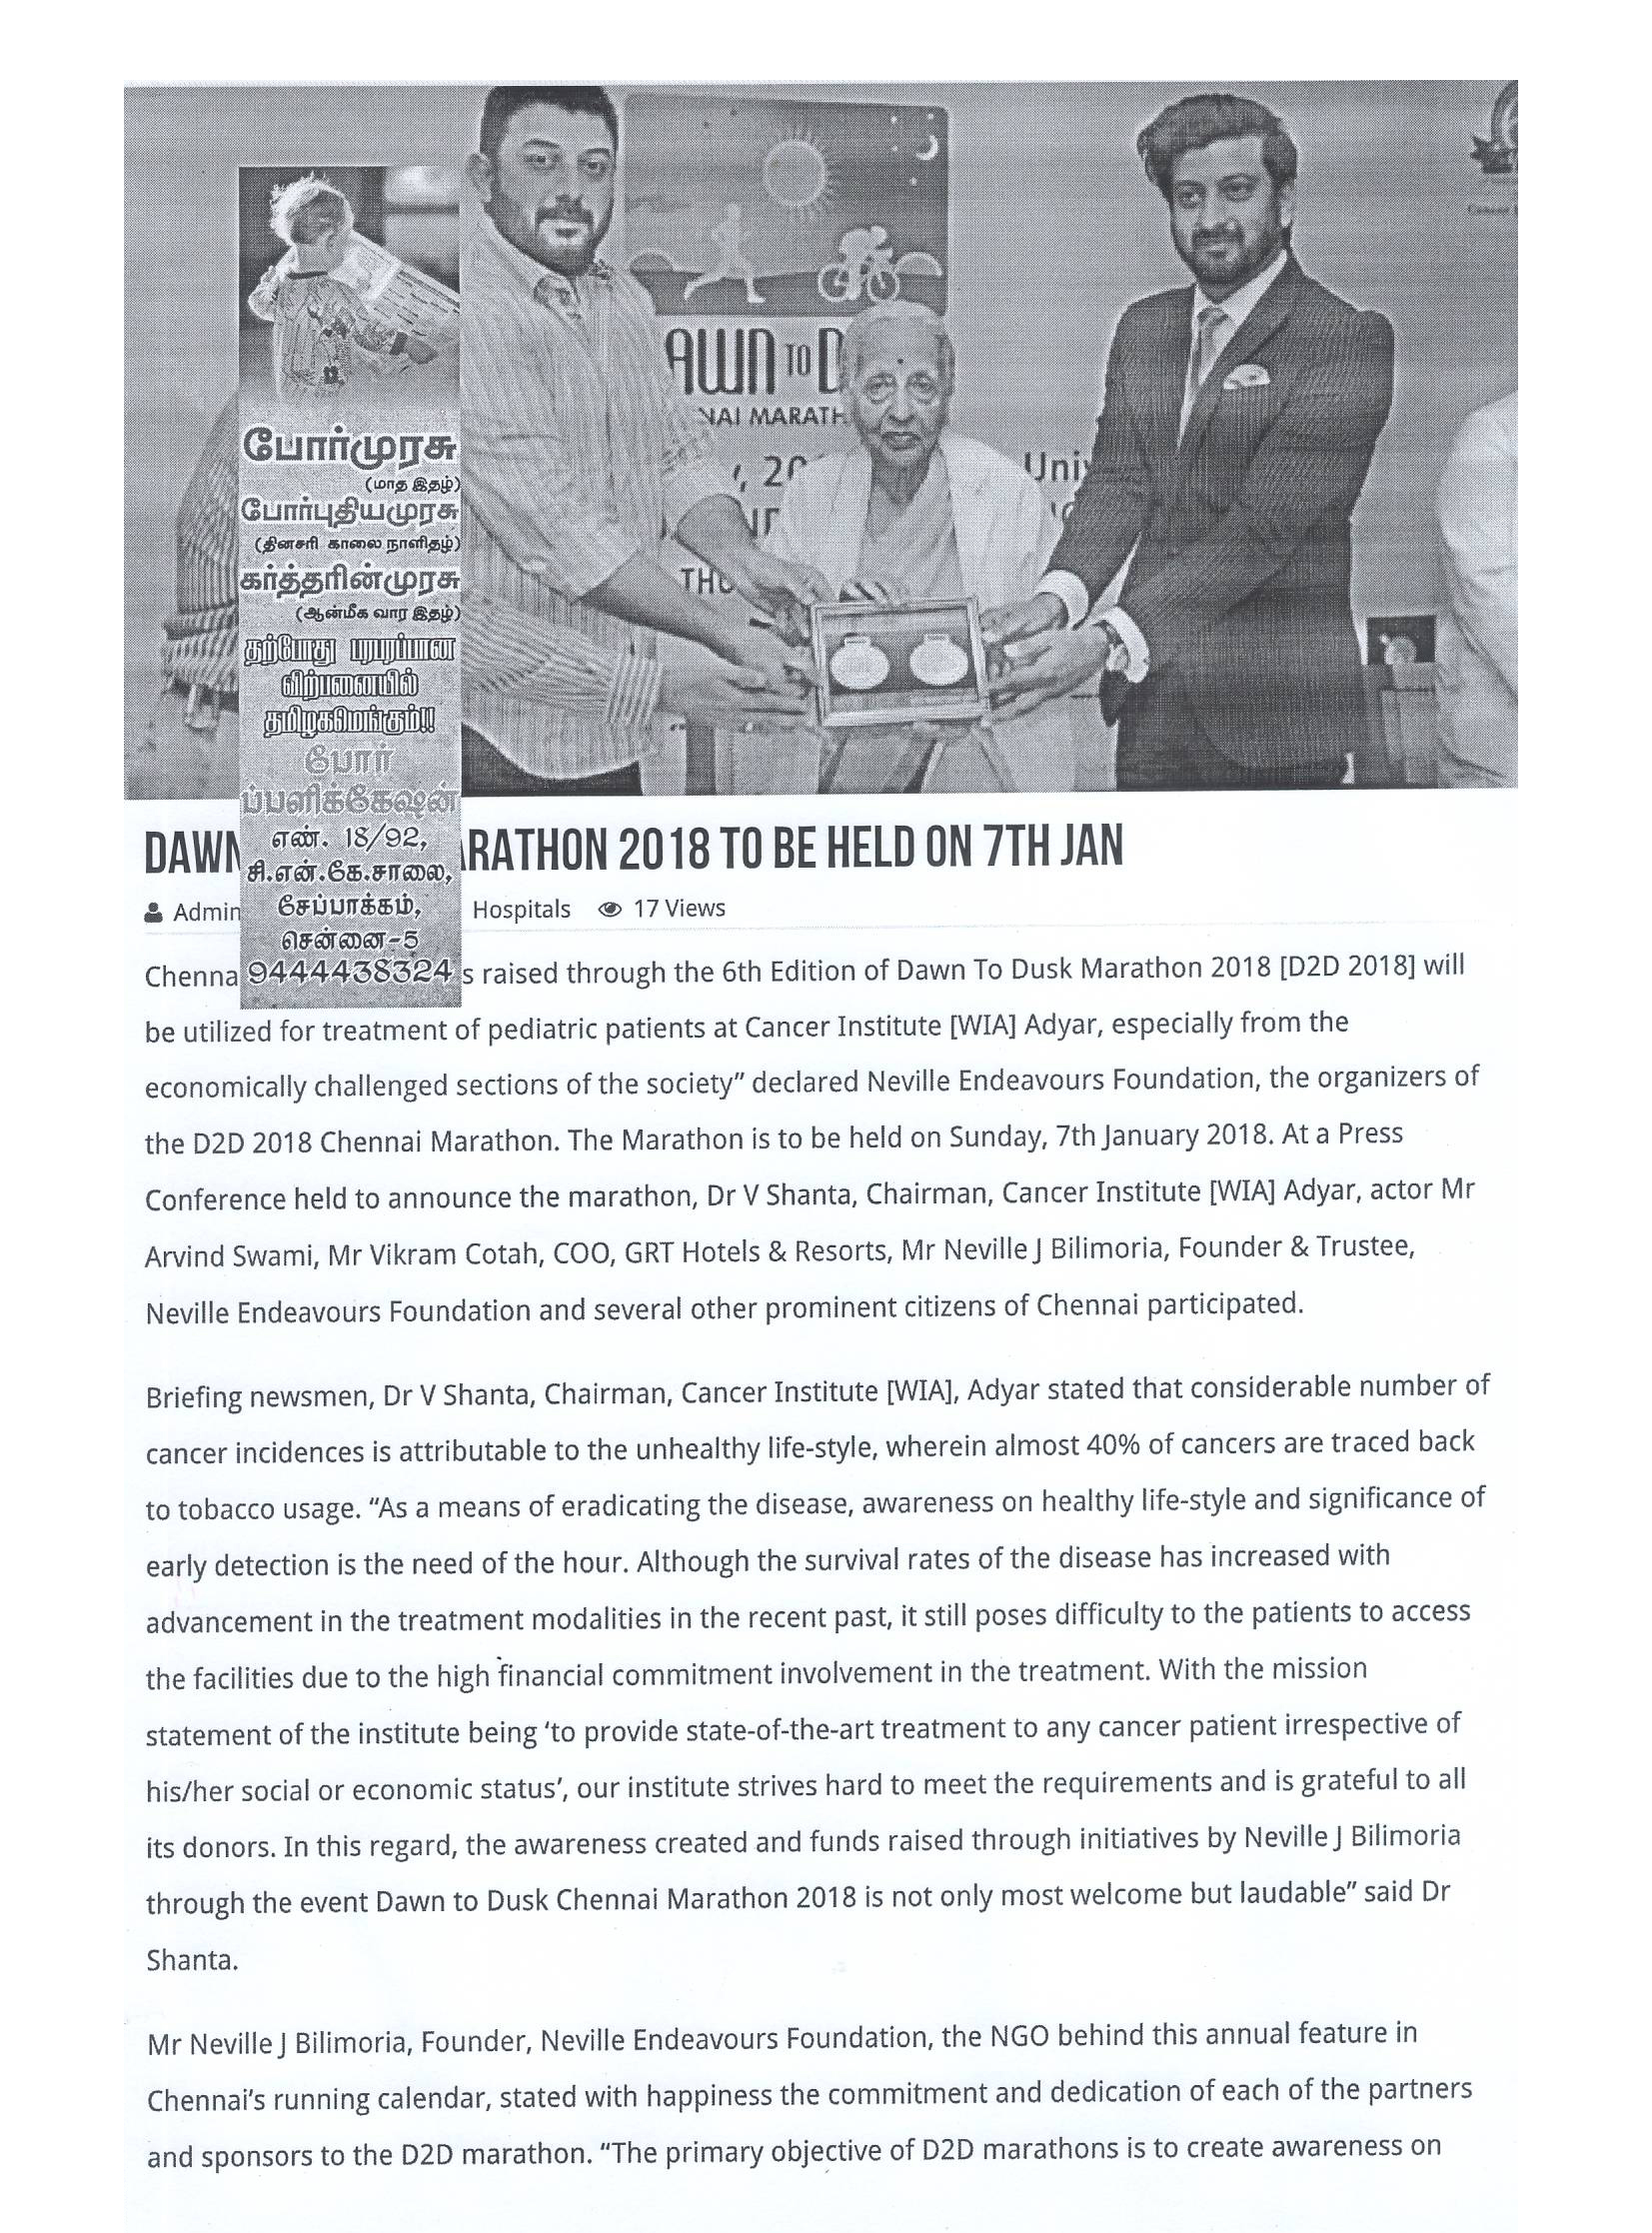 Dawn  To Dusk 2018 – Express news Asia – 04.01.18